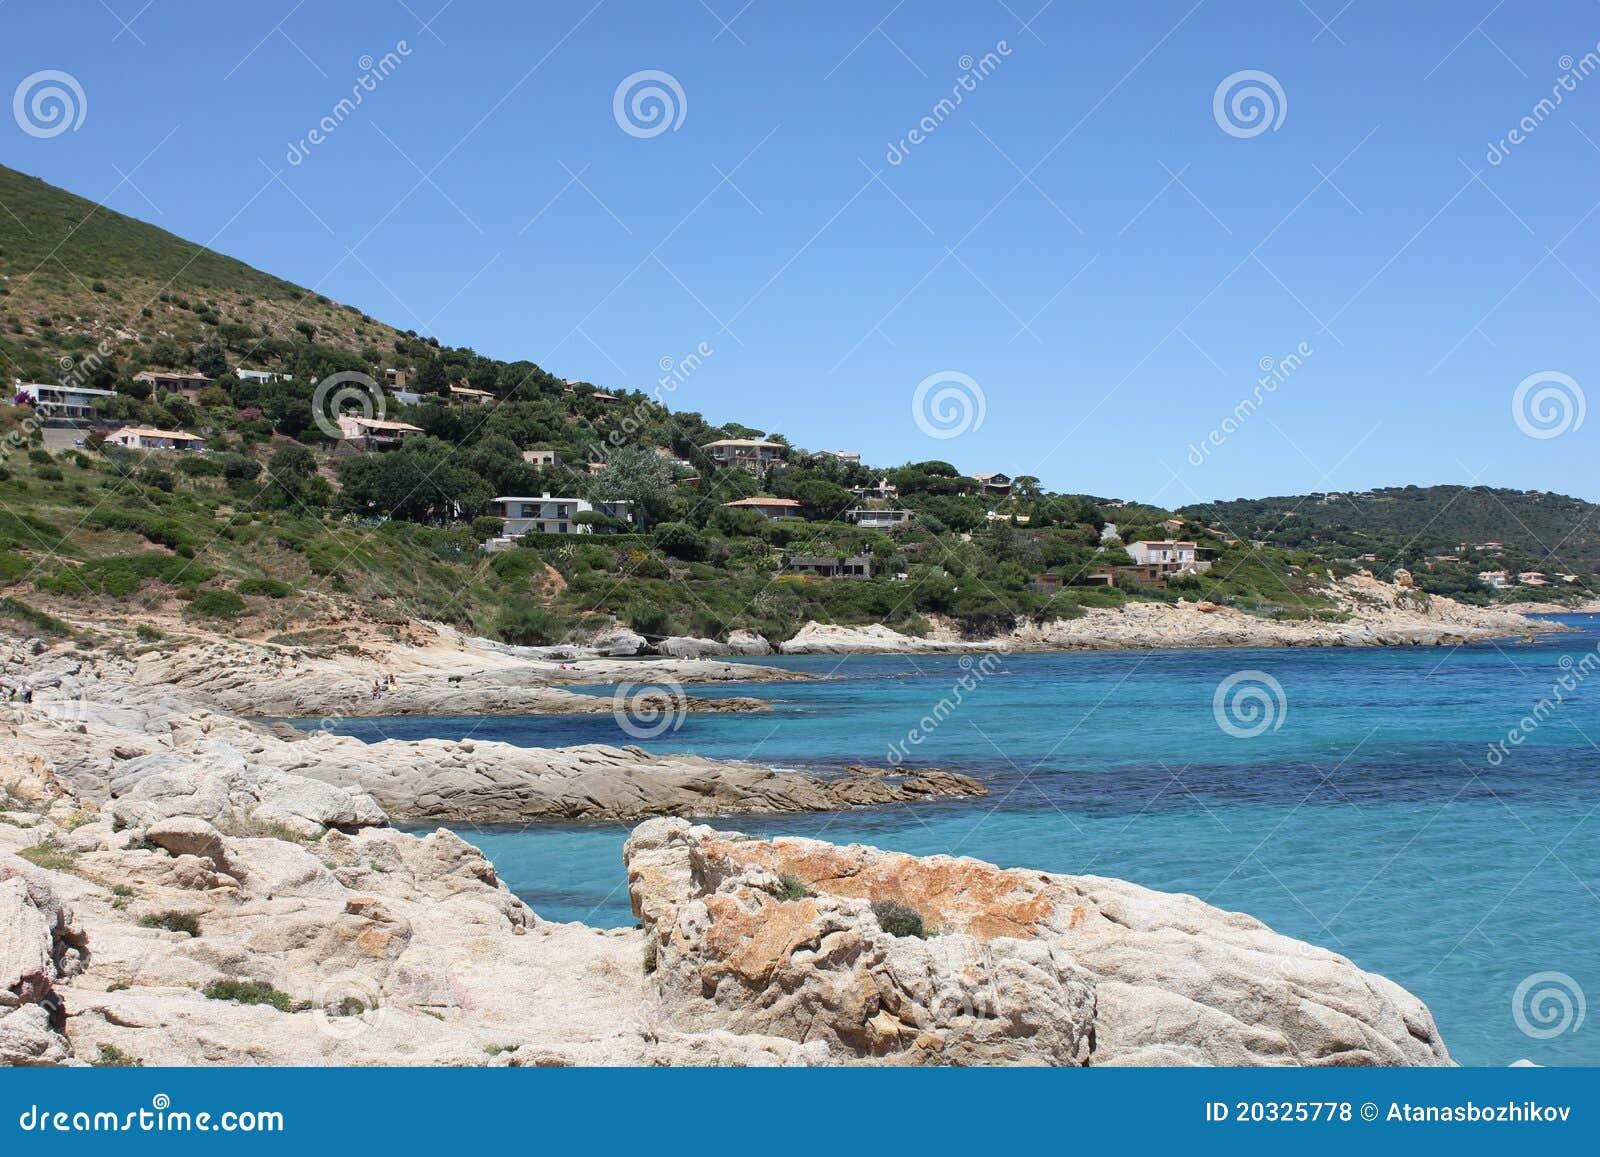 Пляж Bonne Terrase на французском Ривьера